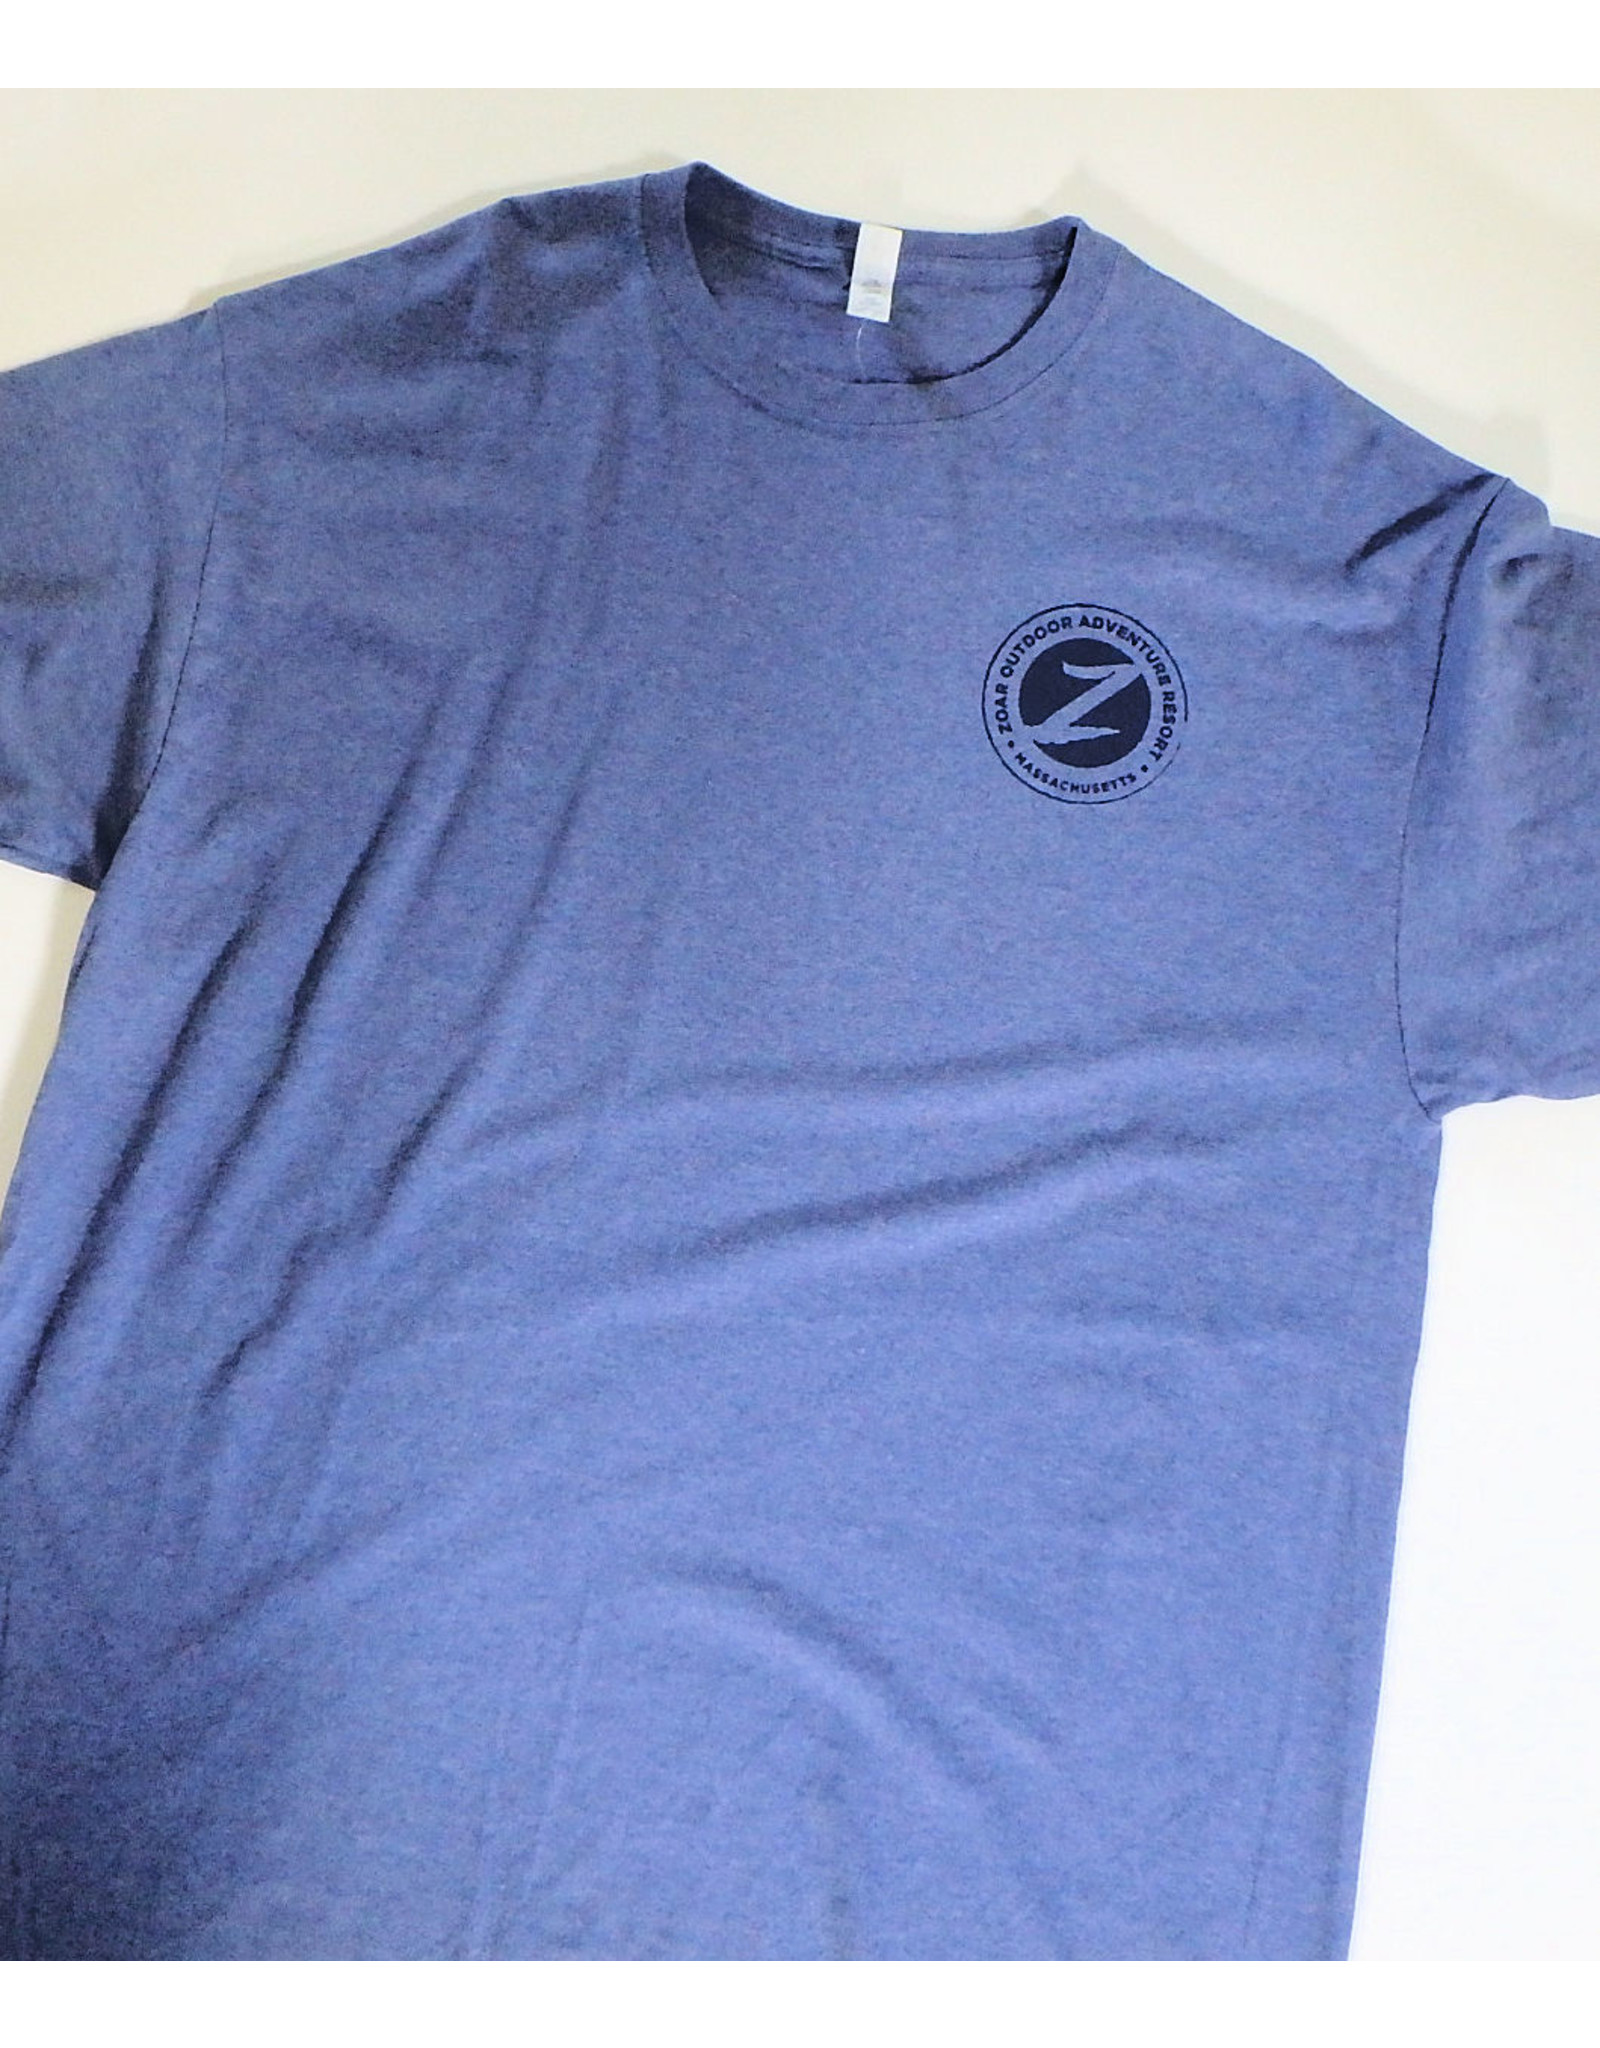 Custom Zoar Power SS T-shirt